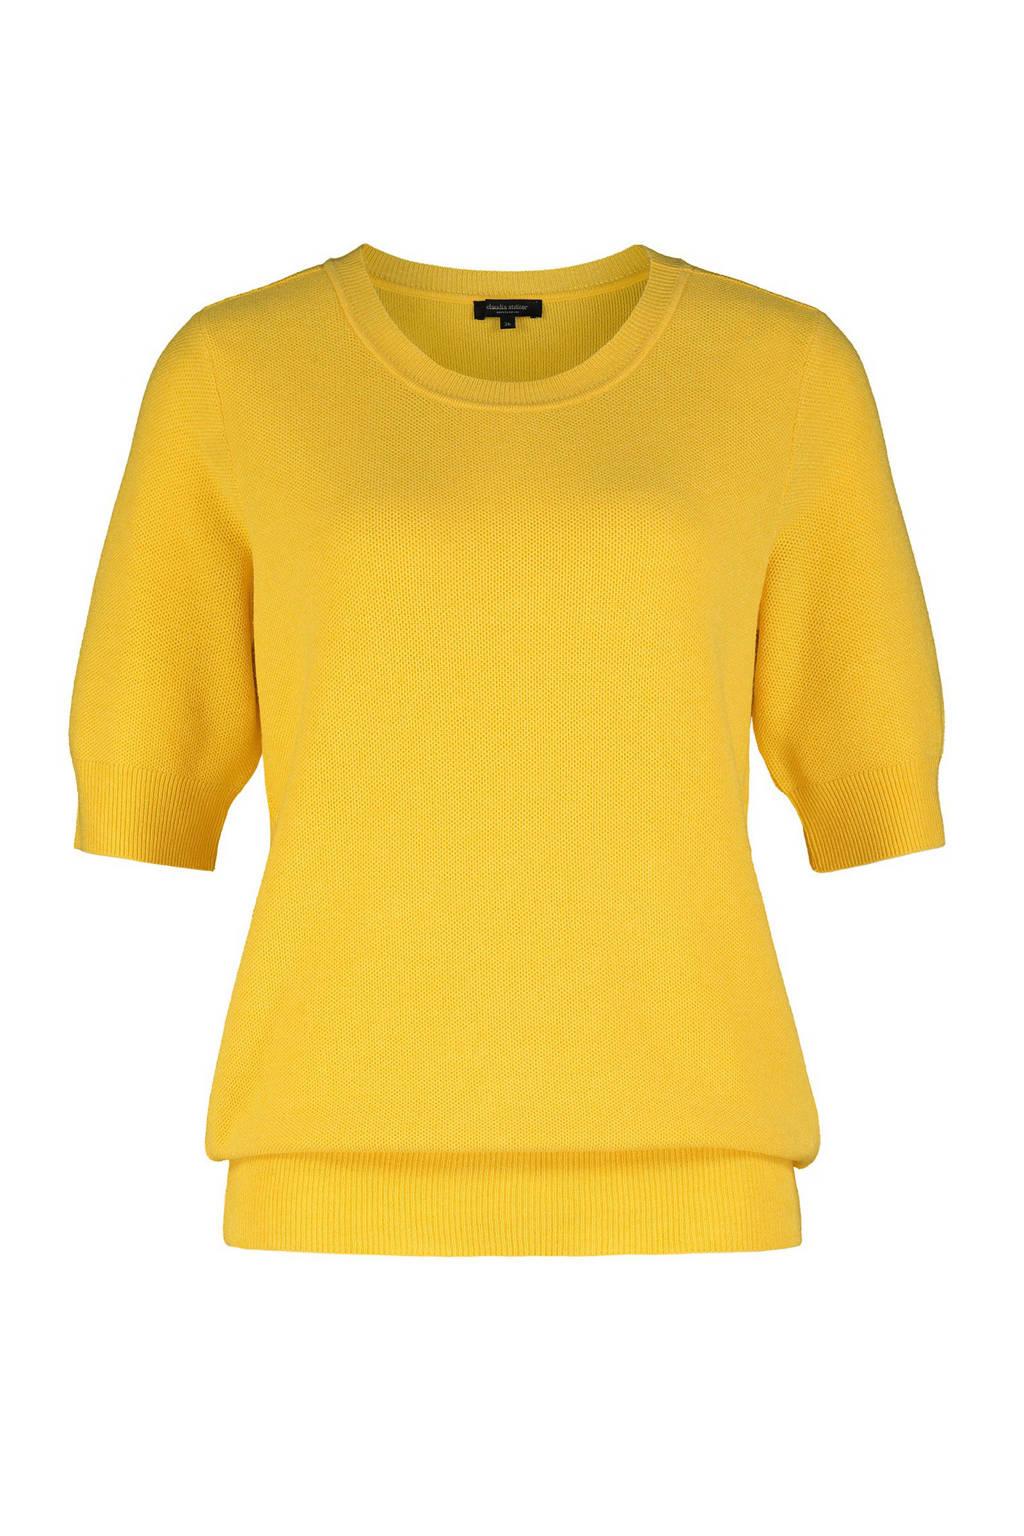 Claudia Sträter ribgebreide trui geel, Geel